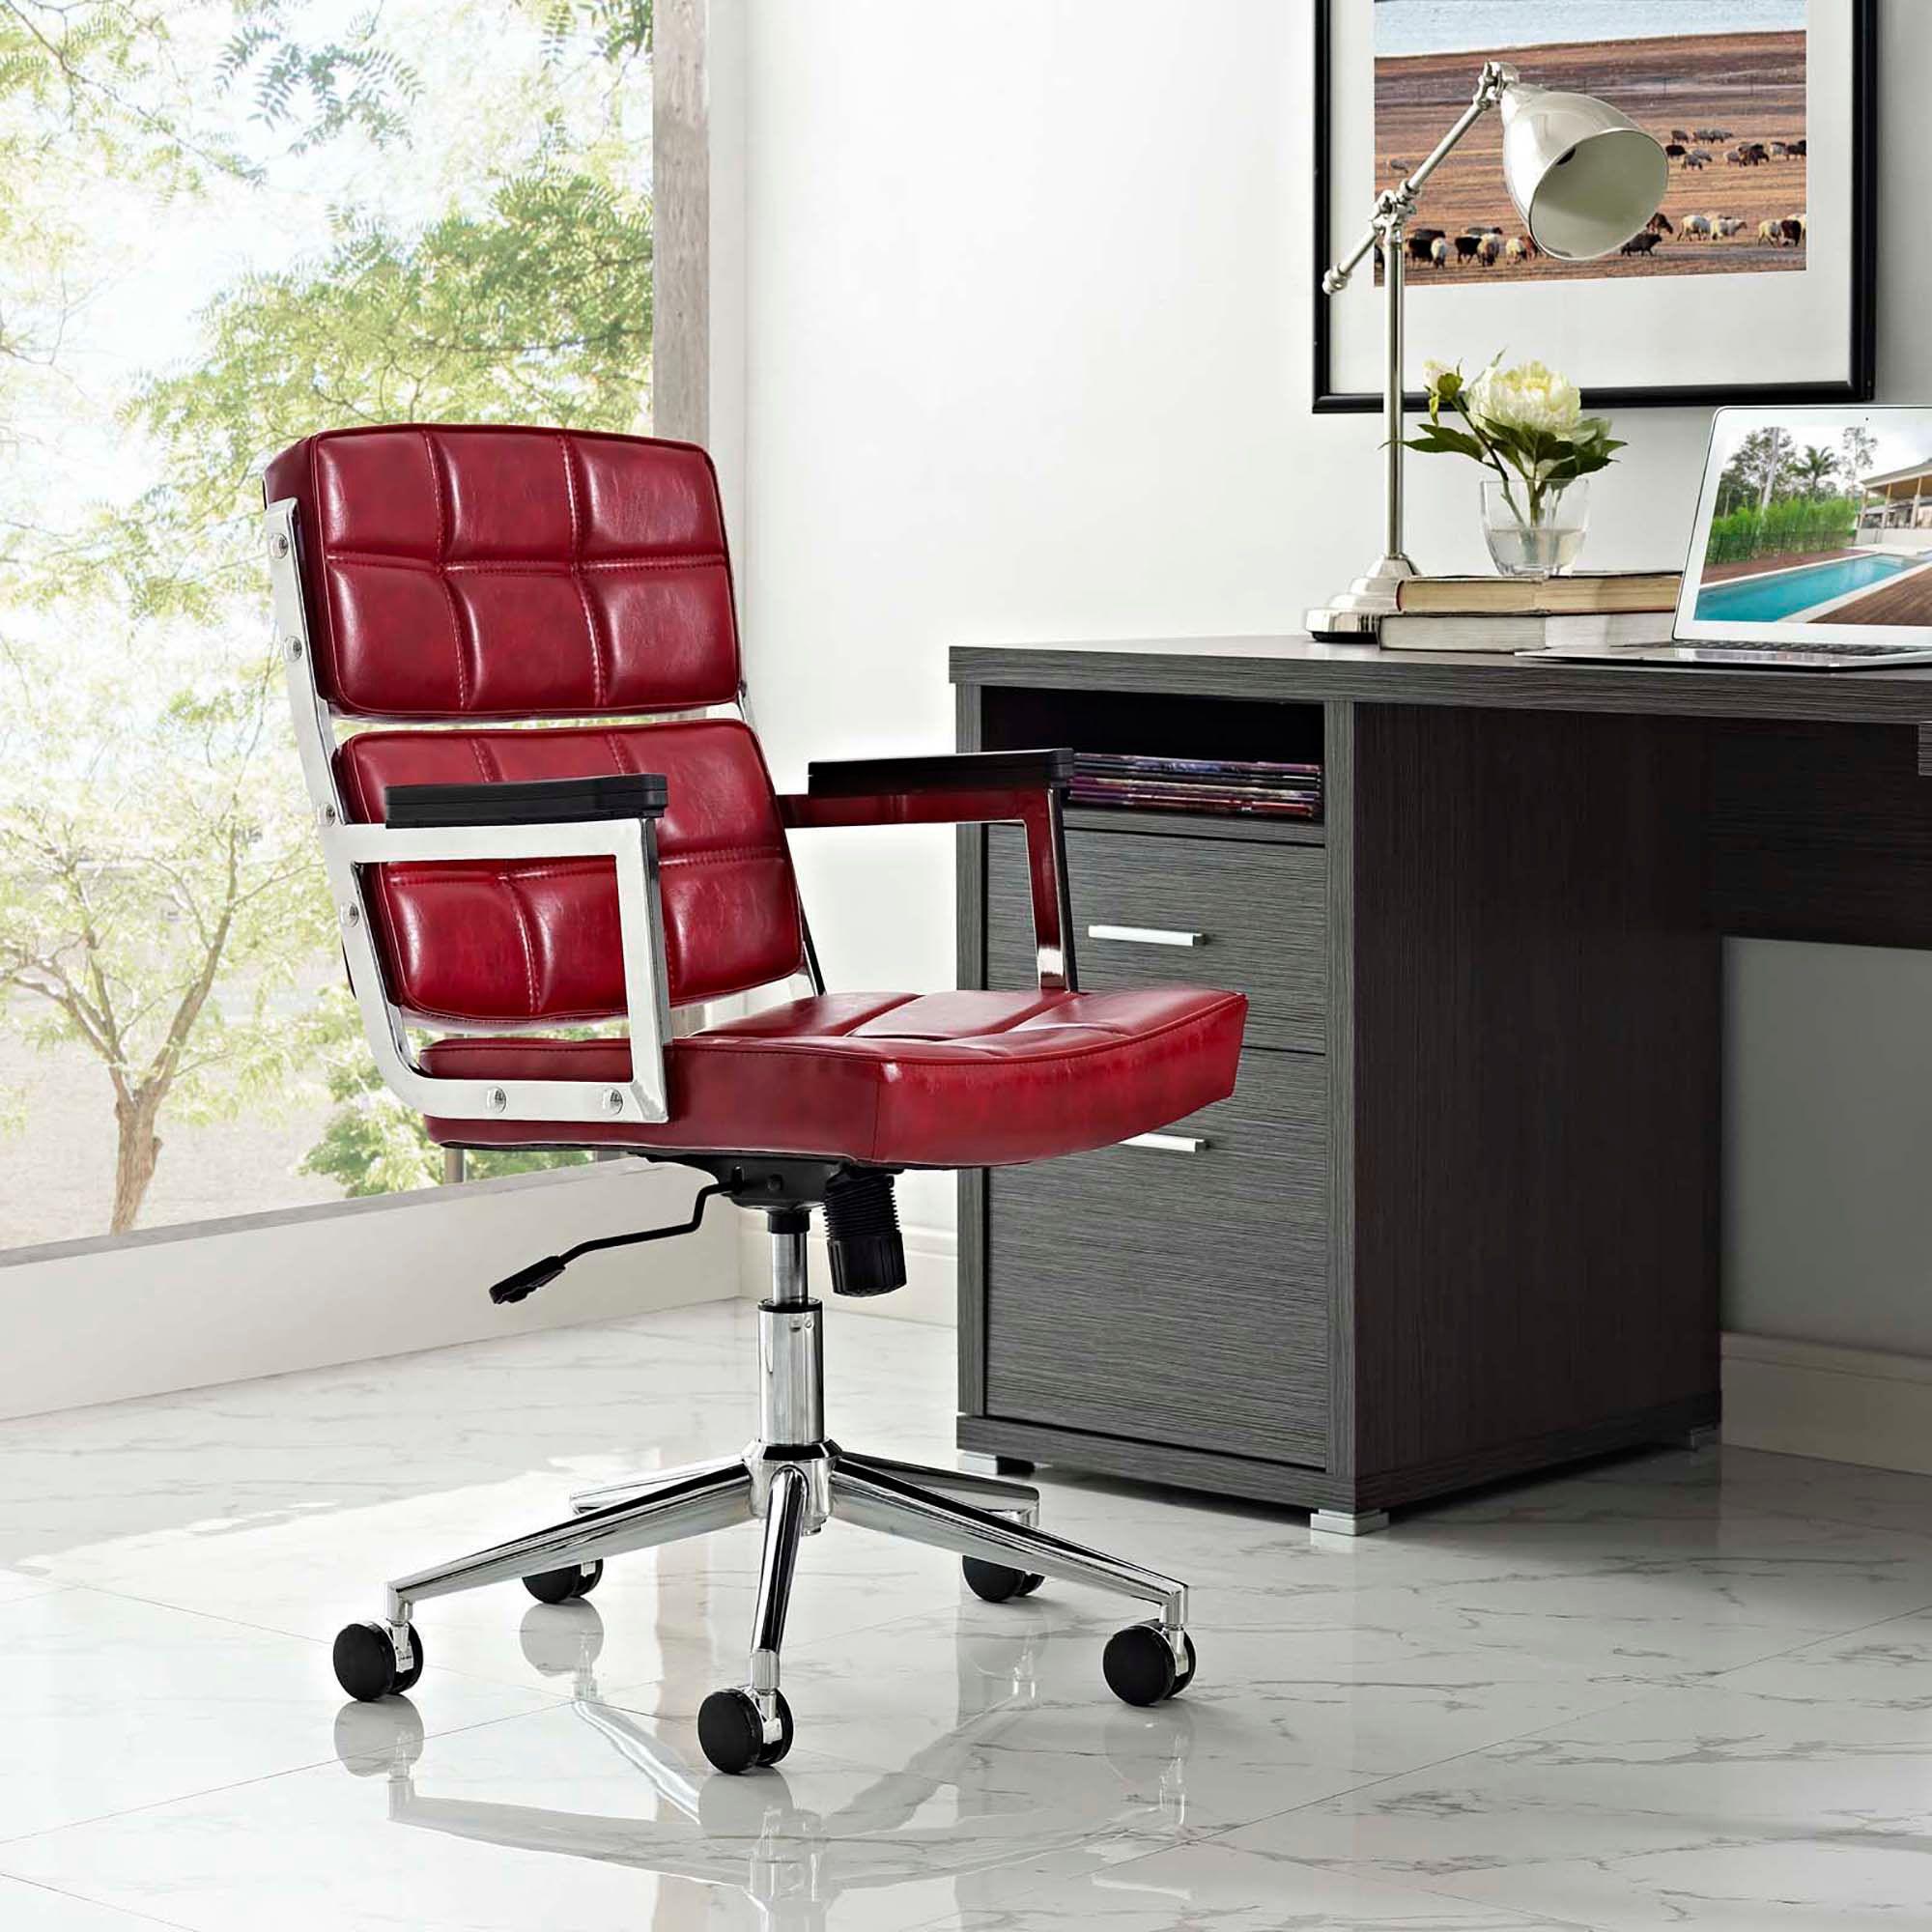 Boldly designed with an impressive tiled design and sharp